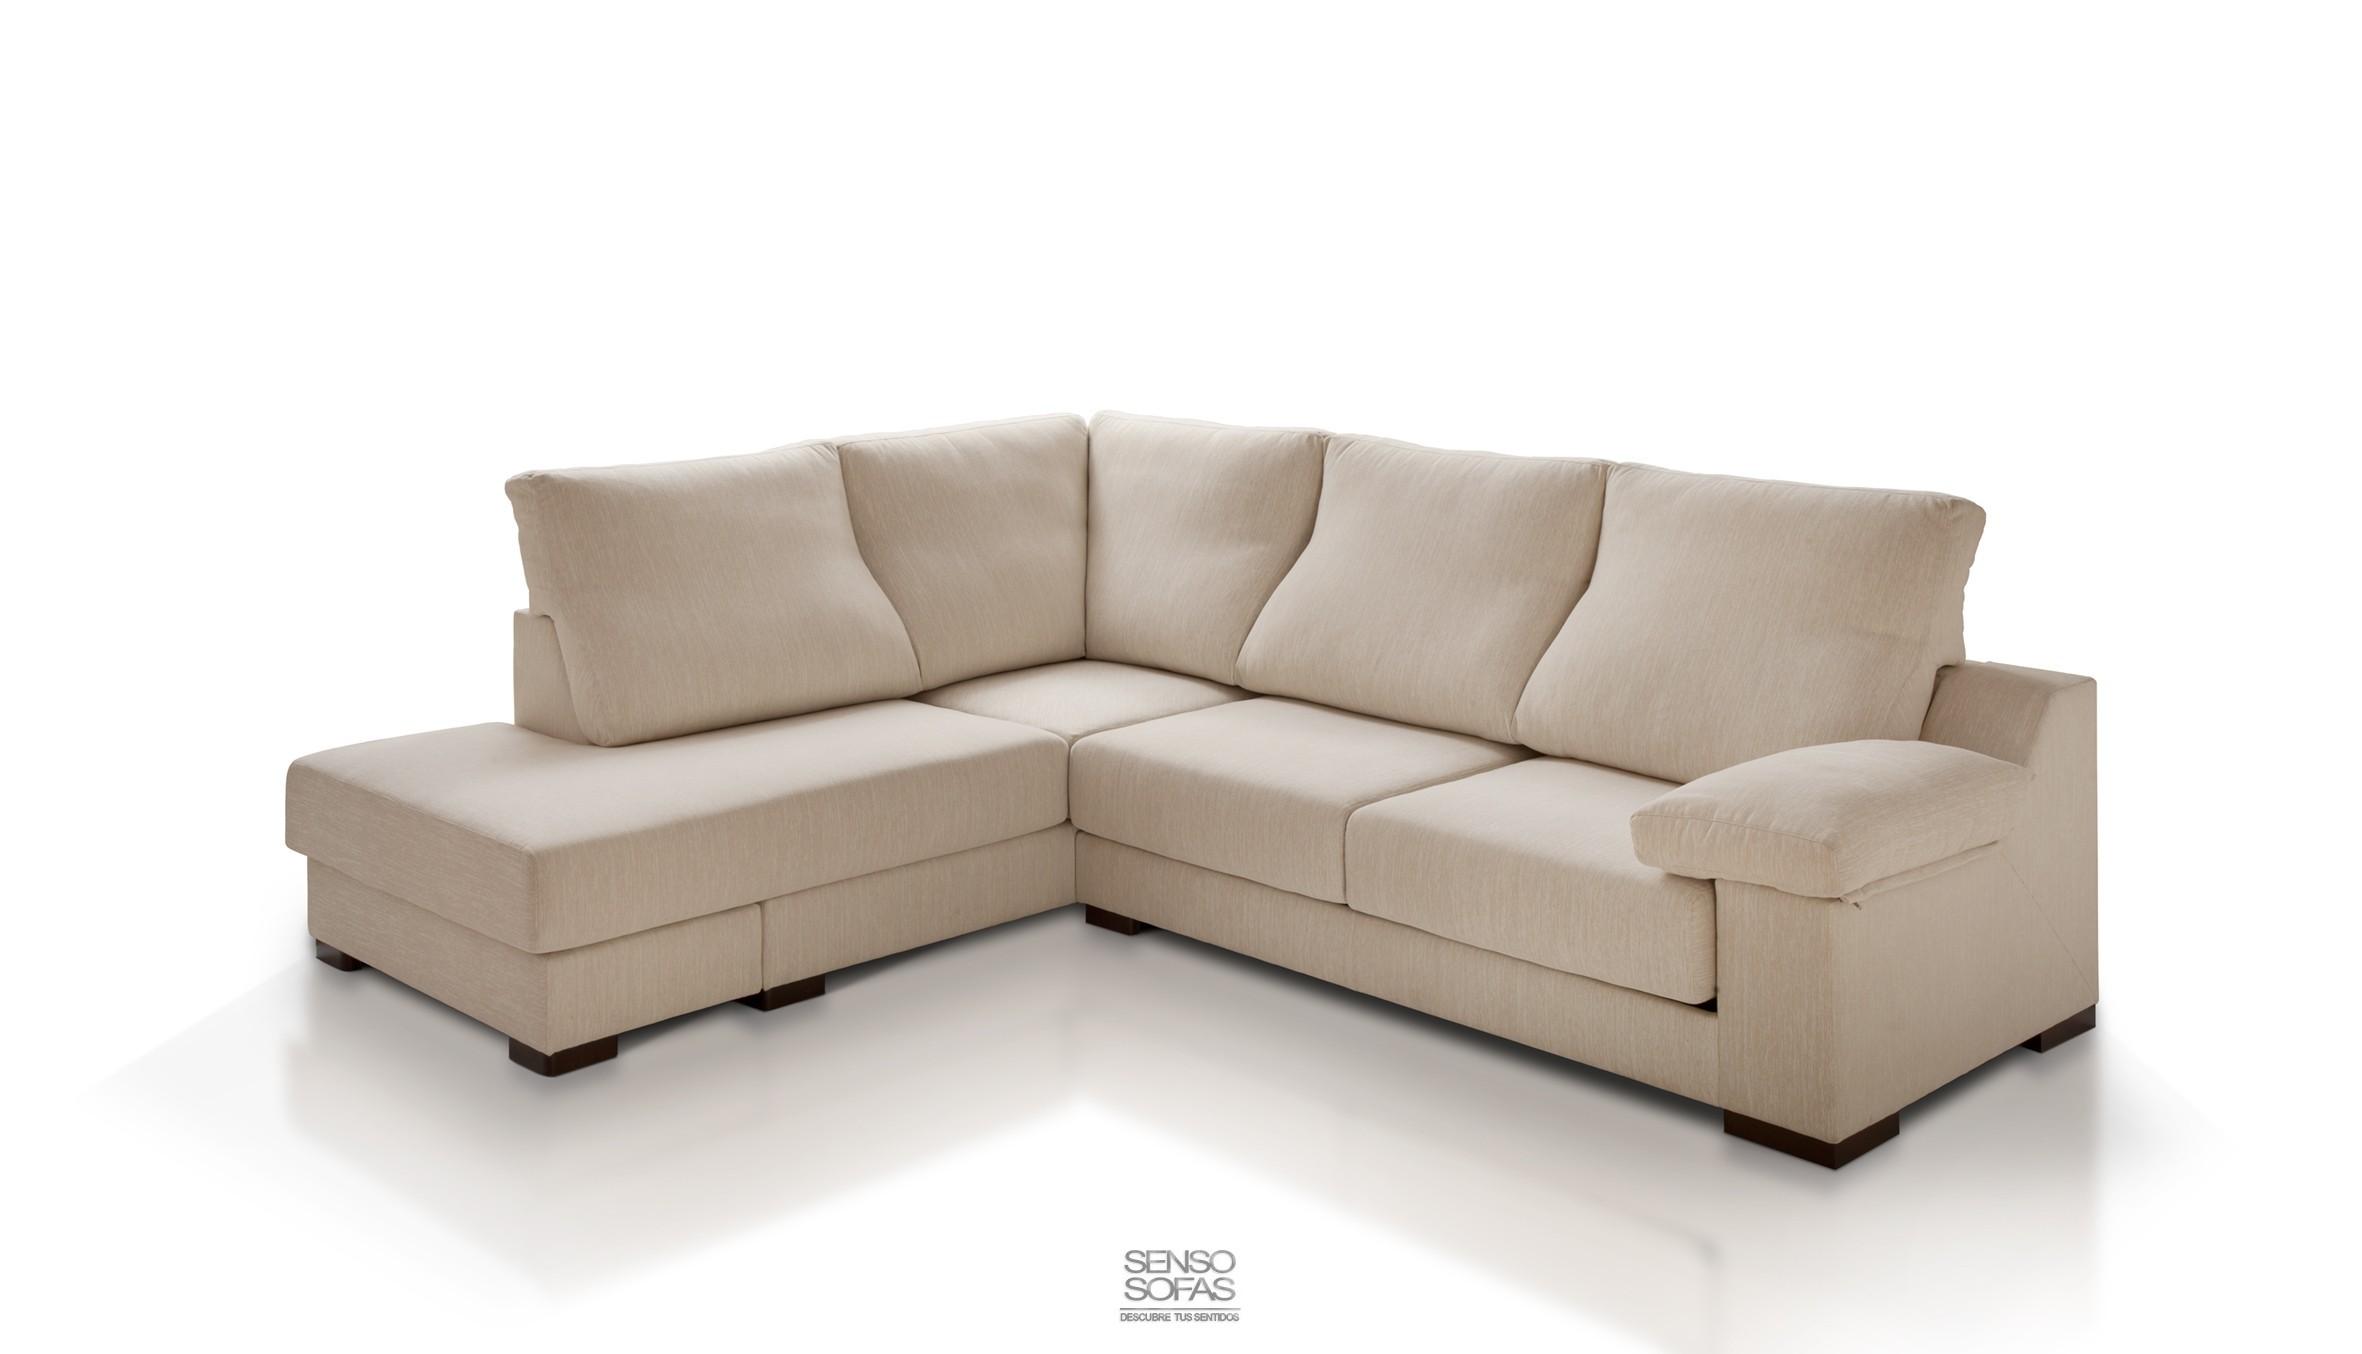 Chaise long murta for Sofas alicante liquidacion